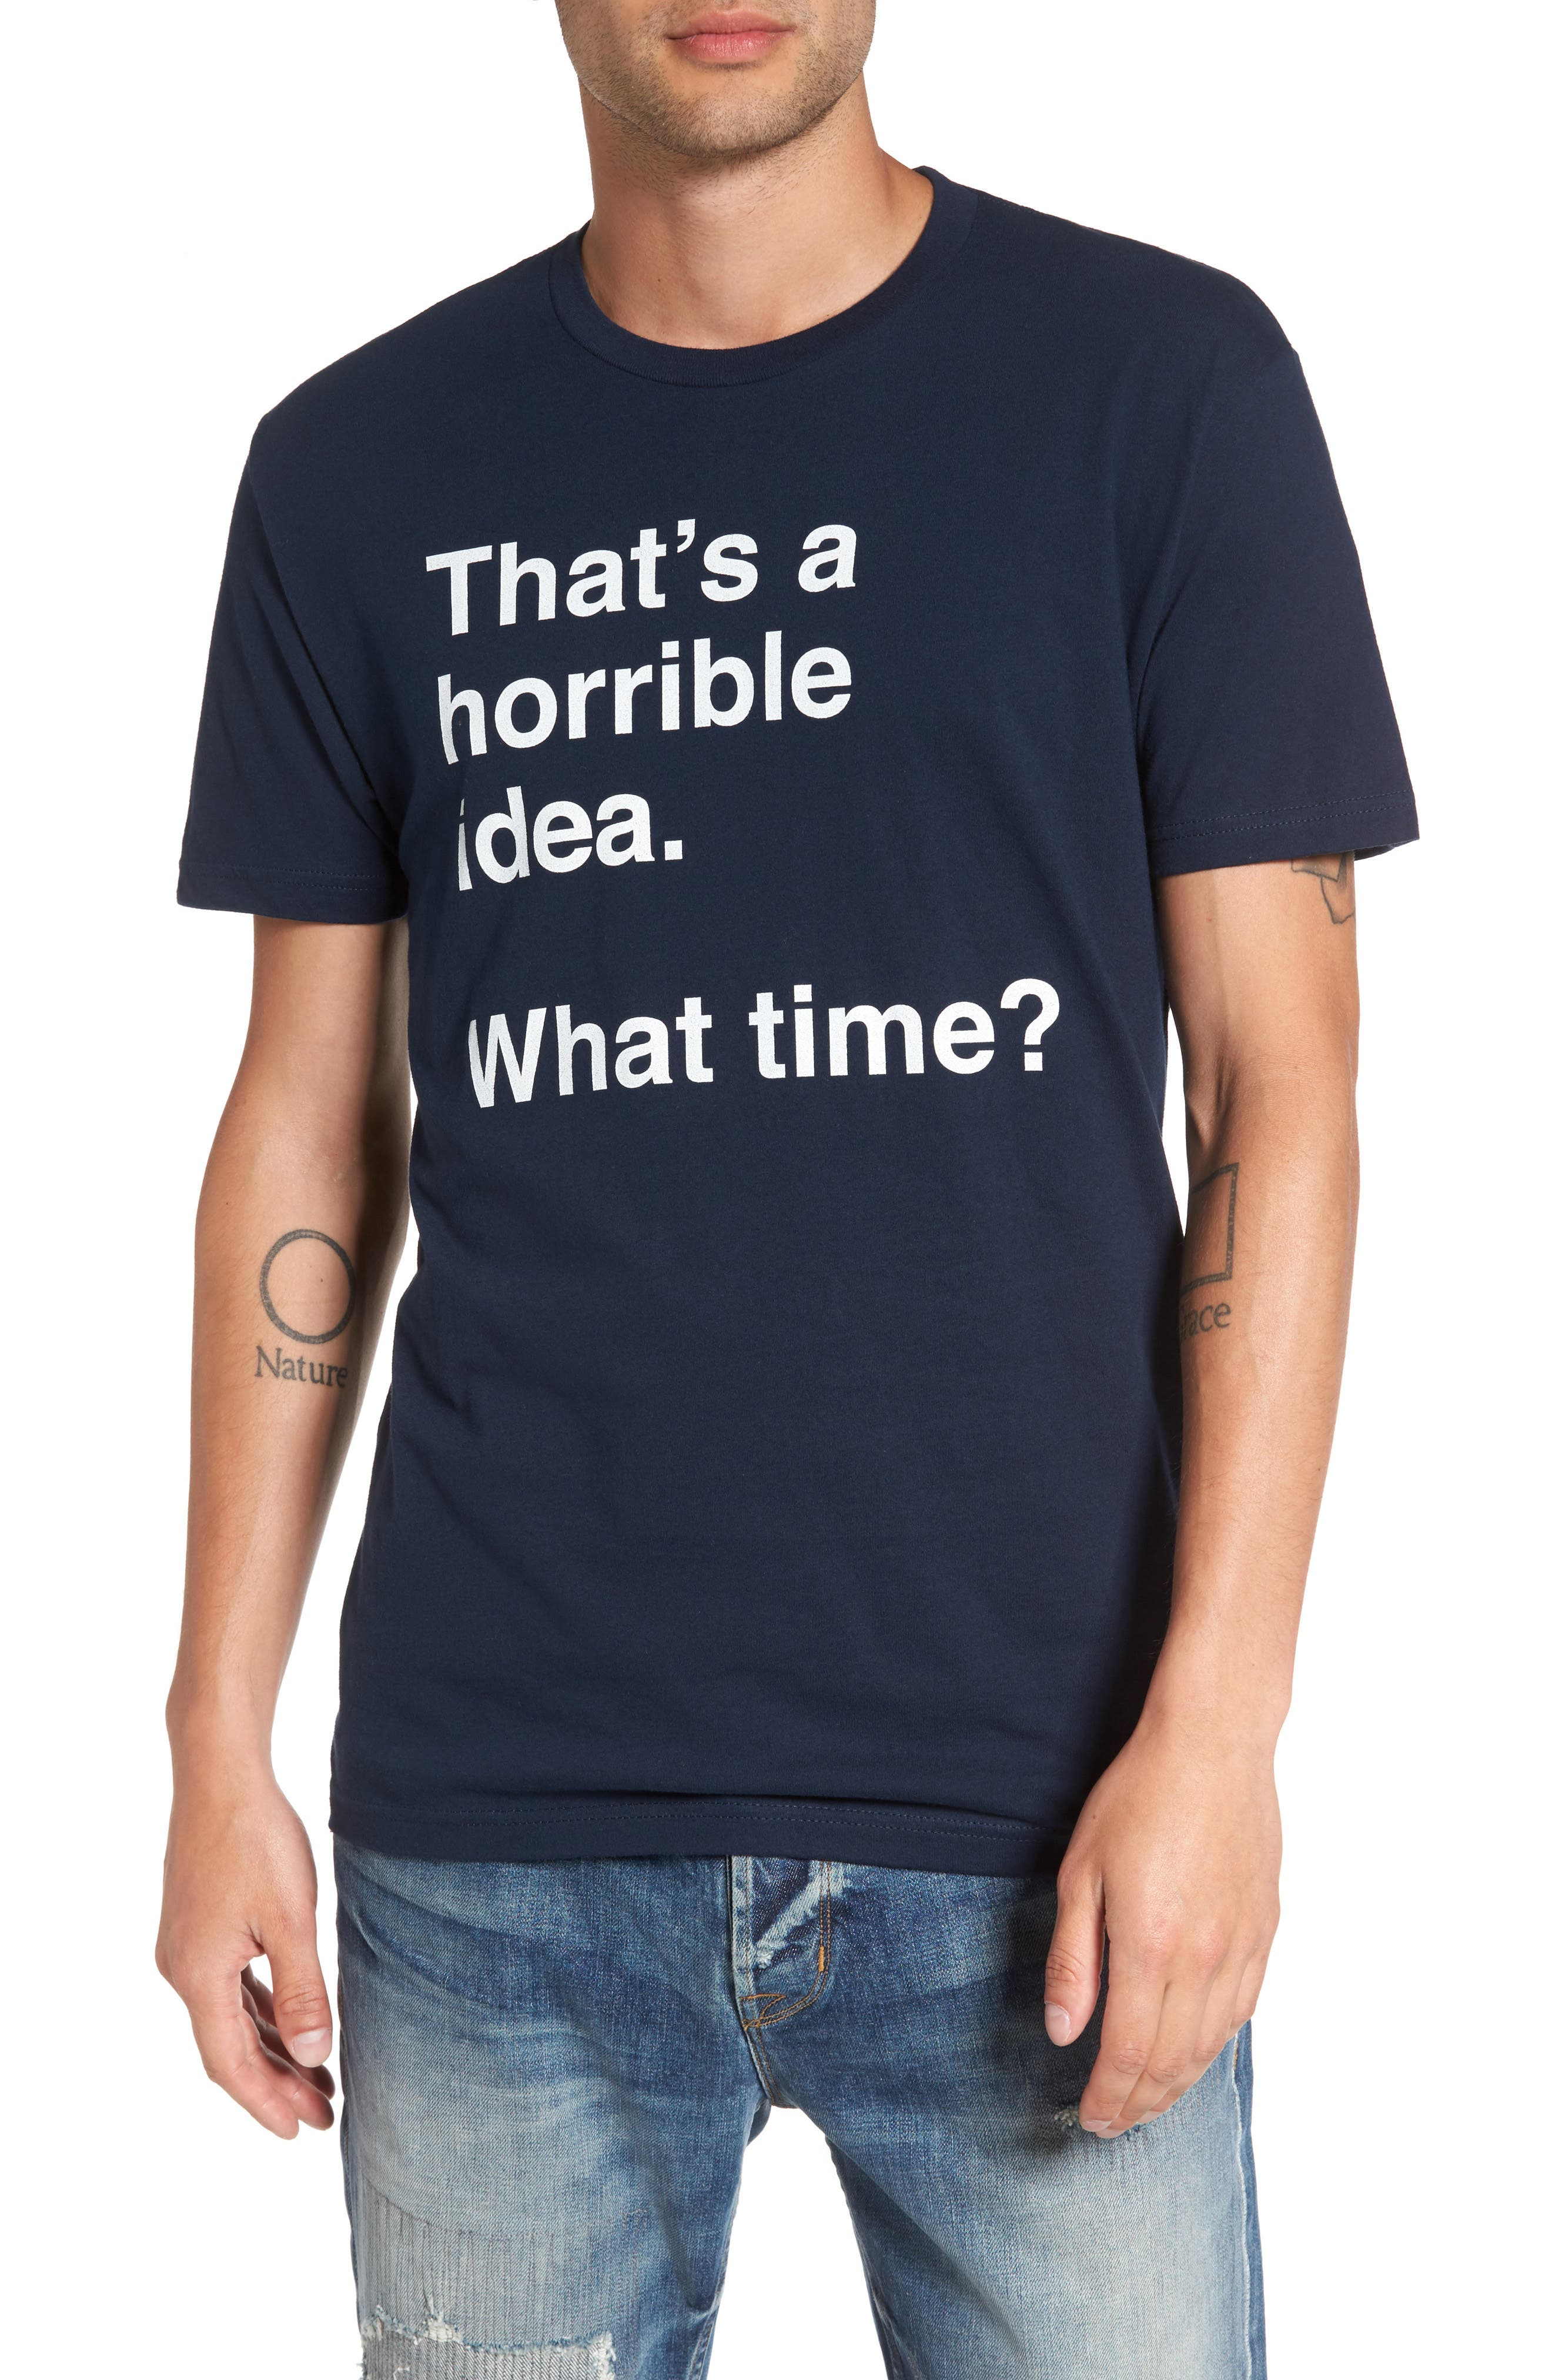 Horrible Idea T-Shirt,                             Main thumbnail 1, color,                             410